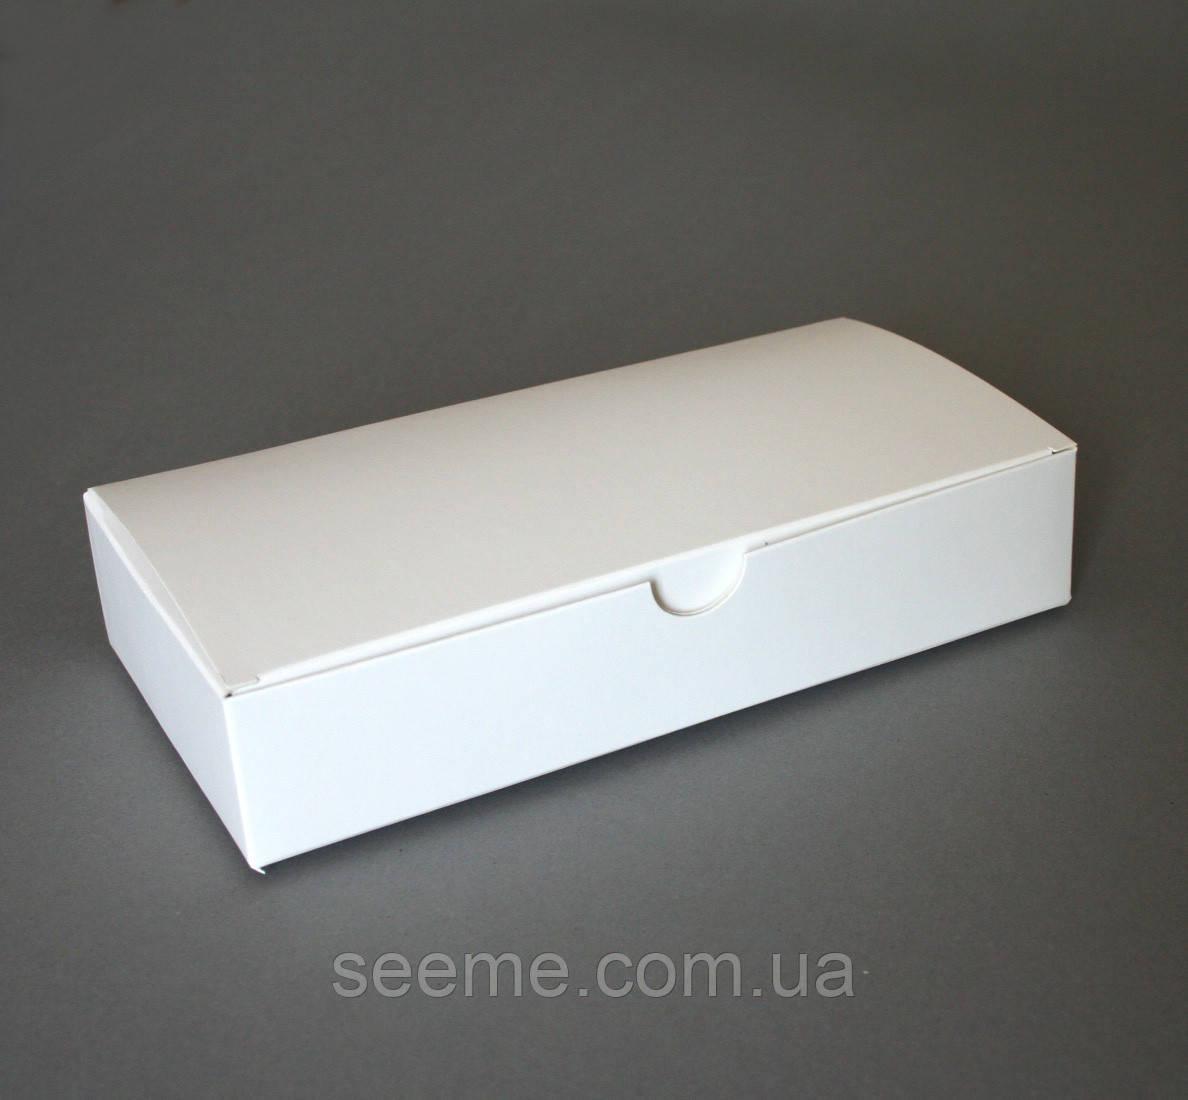 Коробка подарункова, 180х90х35 мм.